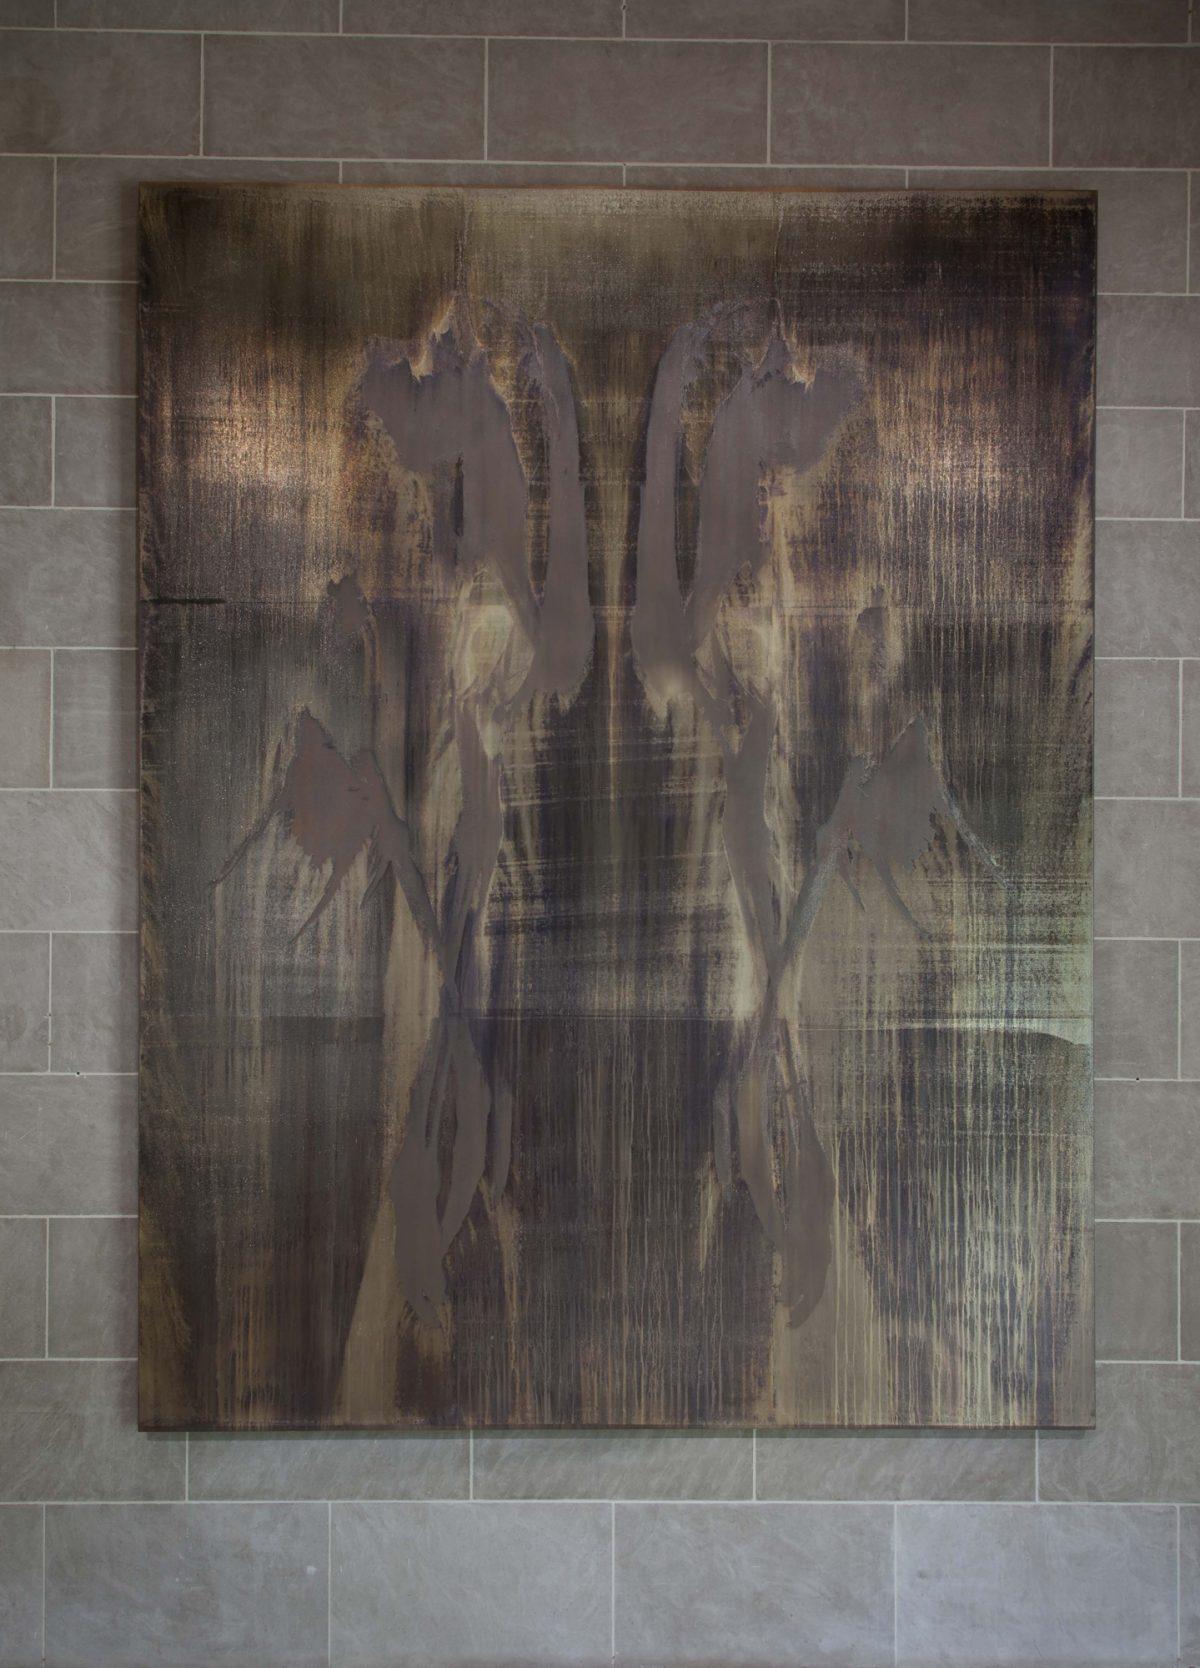 Michael Joo Perspectives Michael Joo Smithsonian Freer Sackler Museum Washington D C  Us Installation View 2016 2